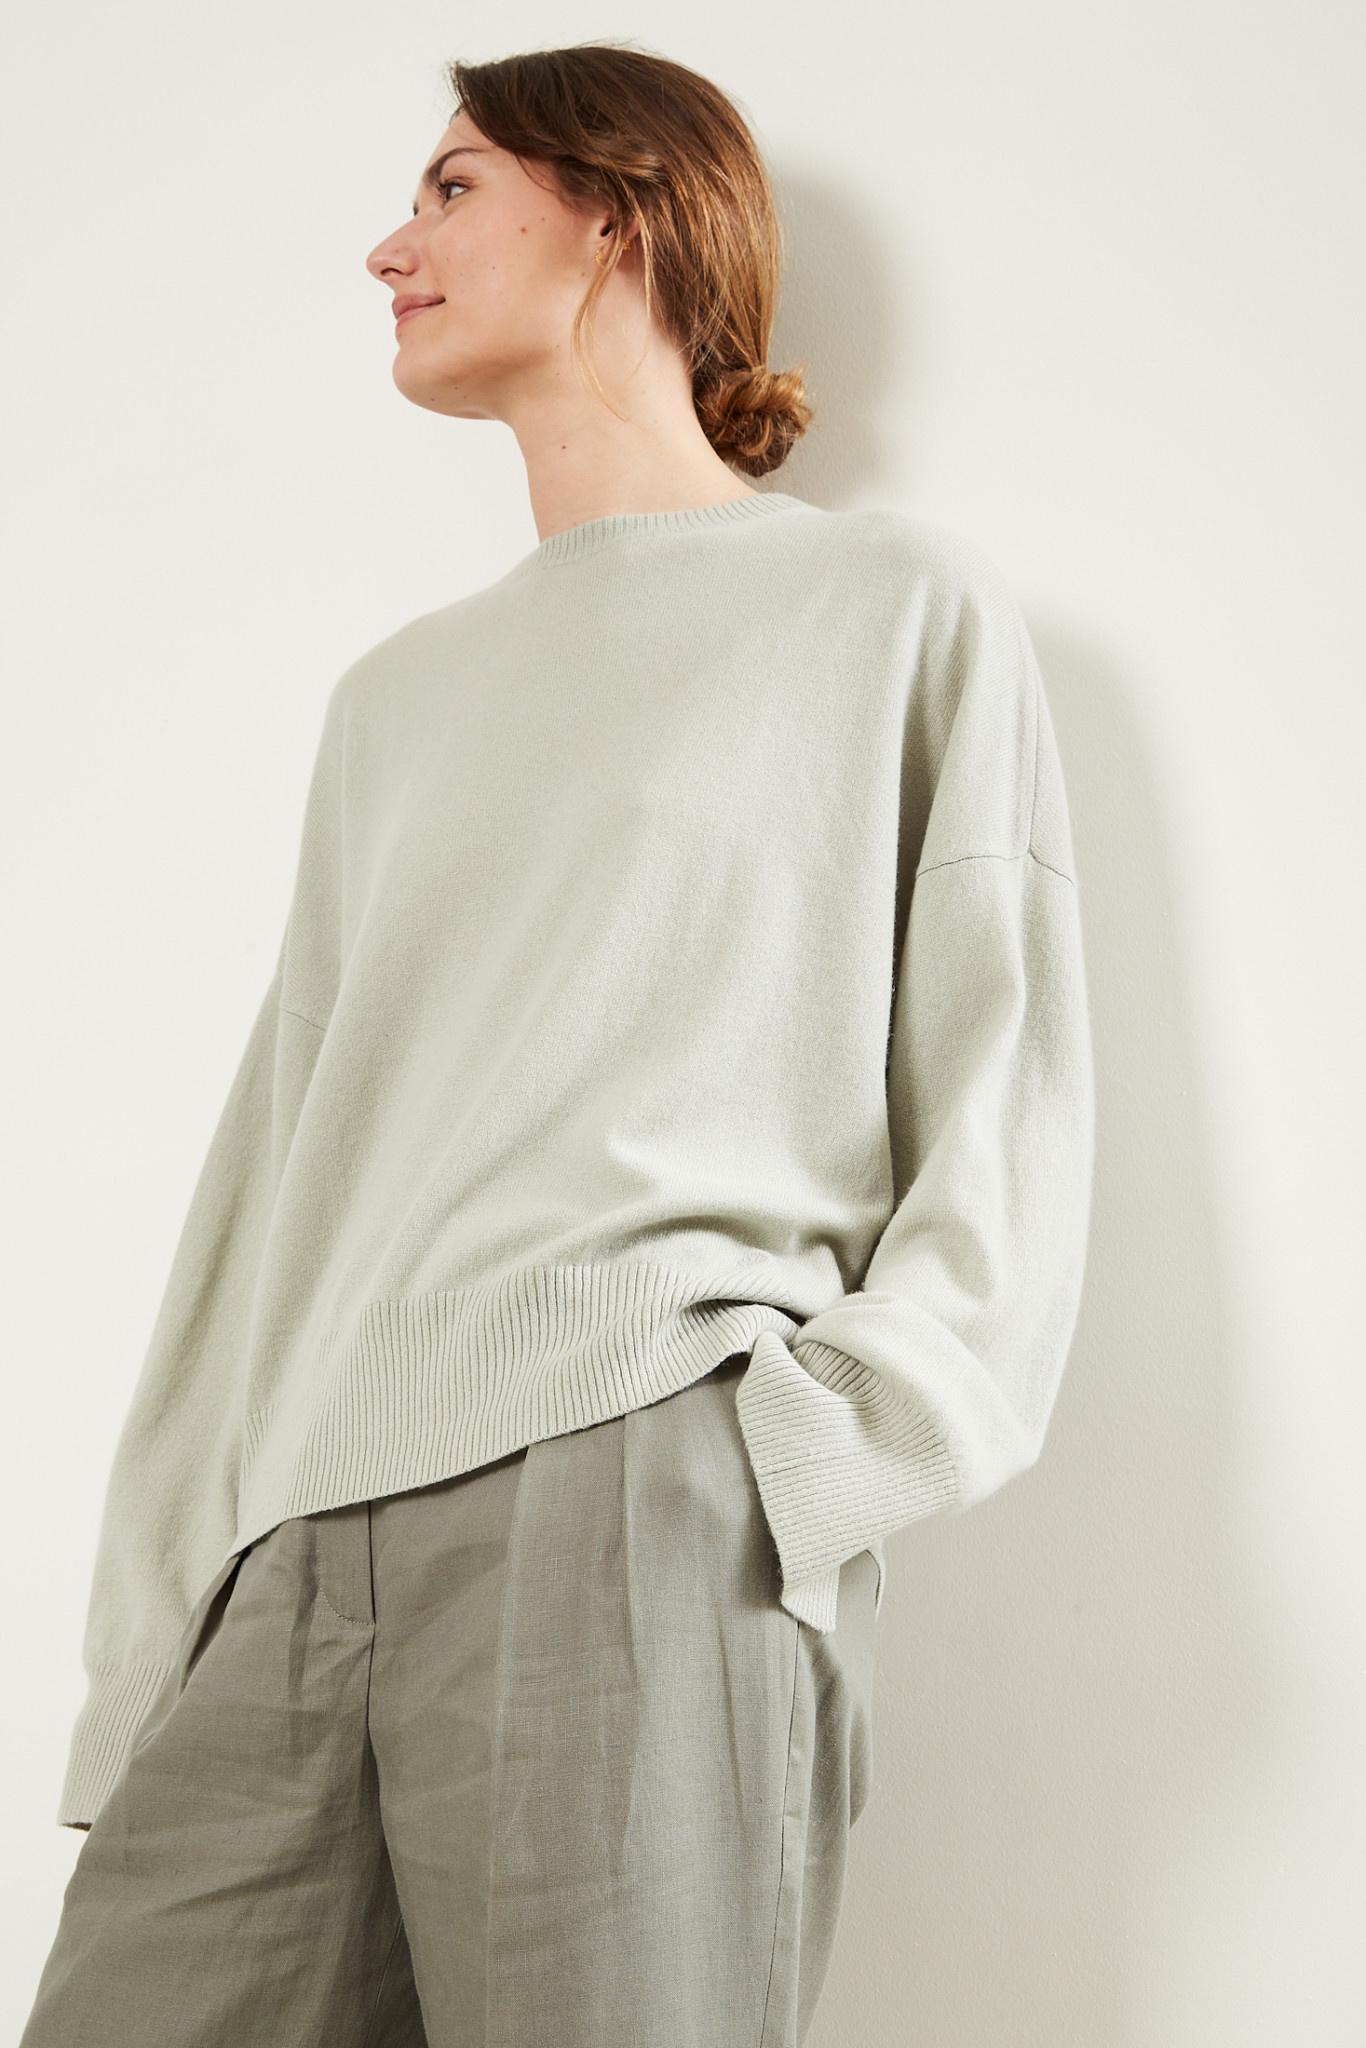 loulou studio Anaa cashmere sweater